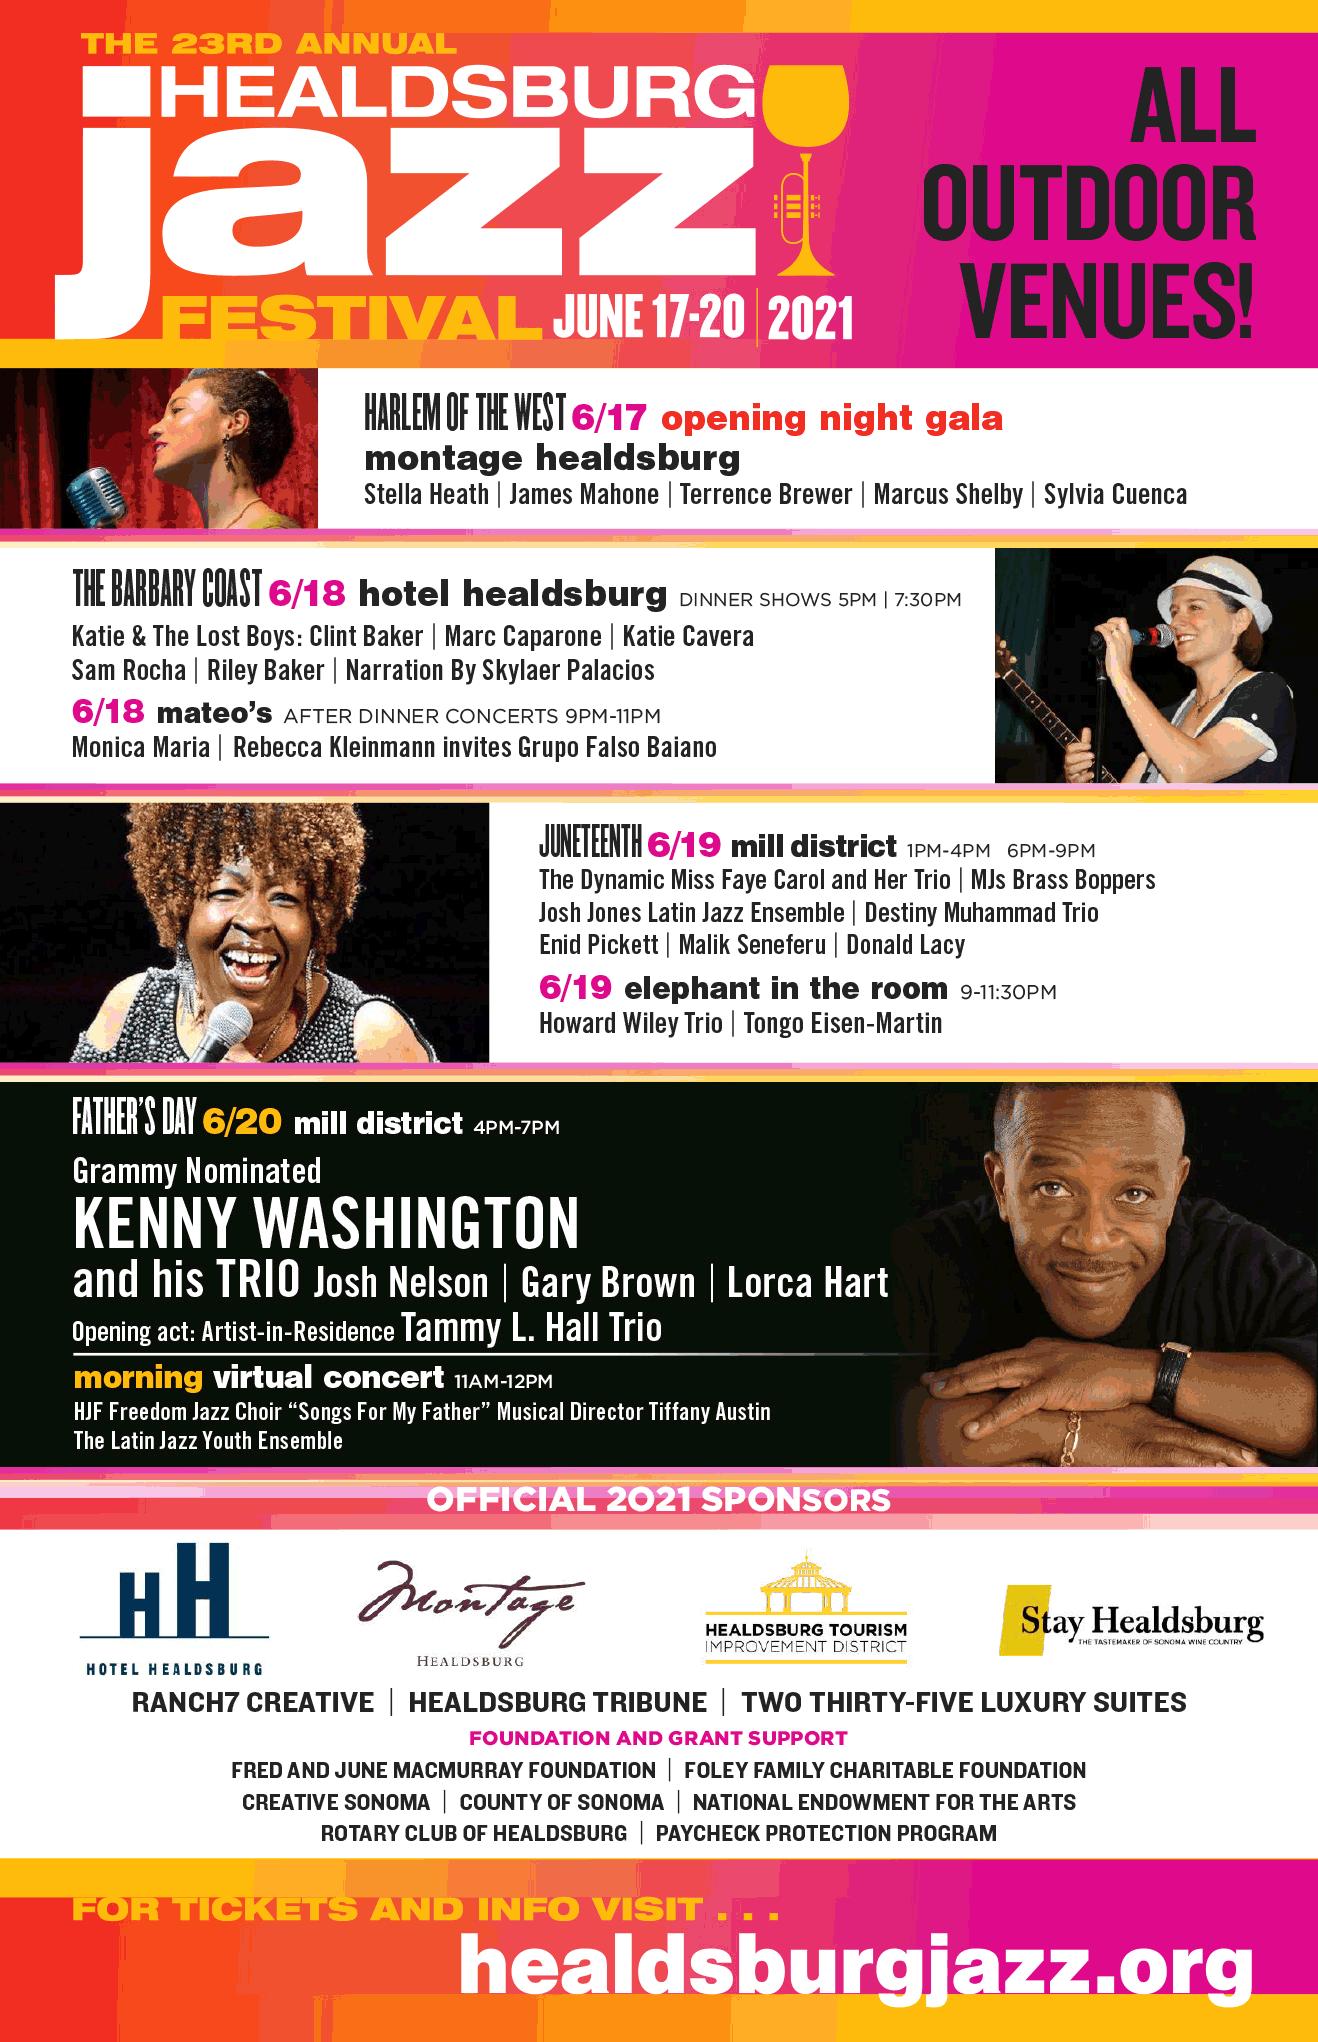 Healdsburg Jazz Festival - 2021